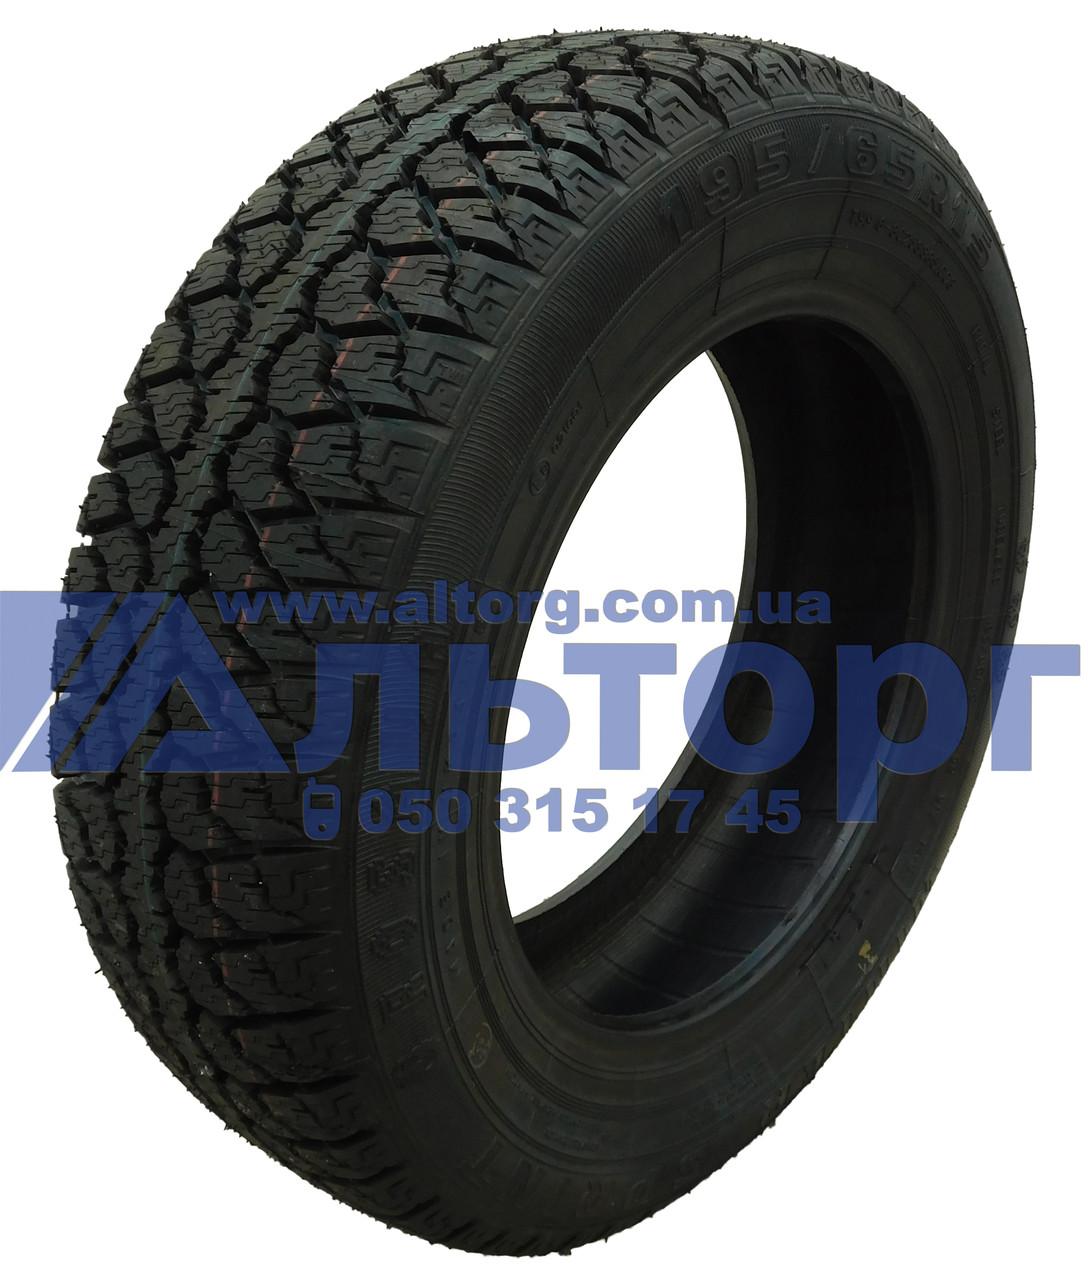 Зимняя шина 195/65R15 BC-52 - Росава